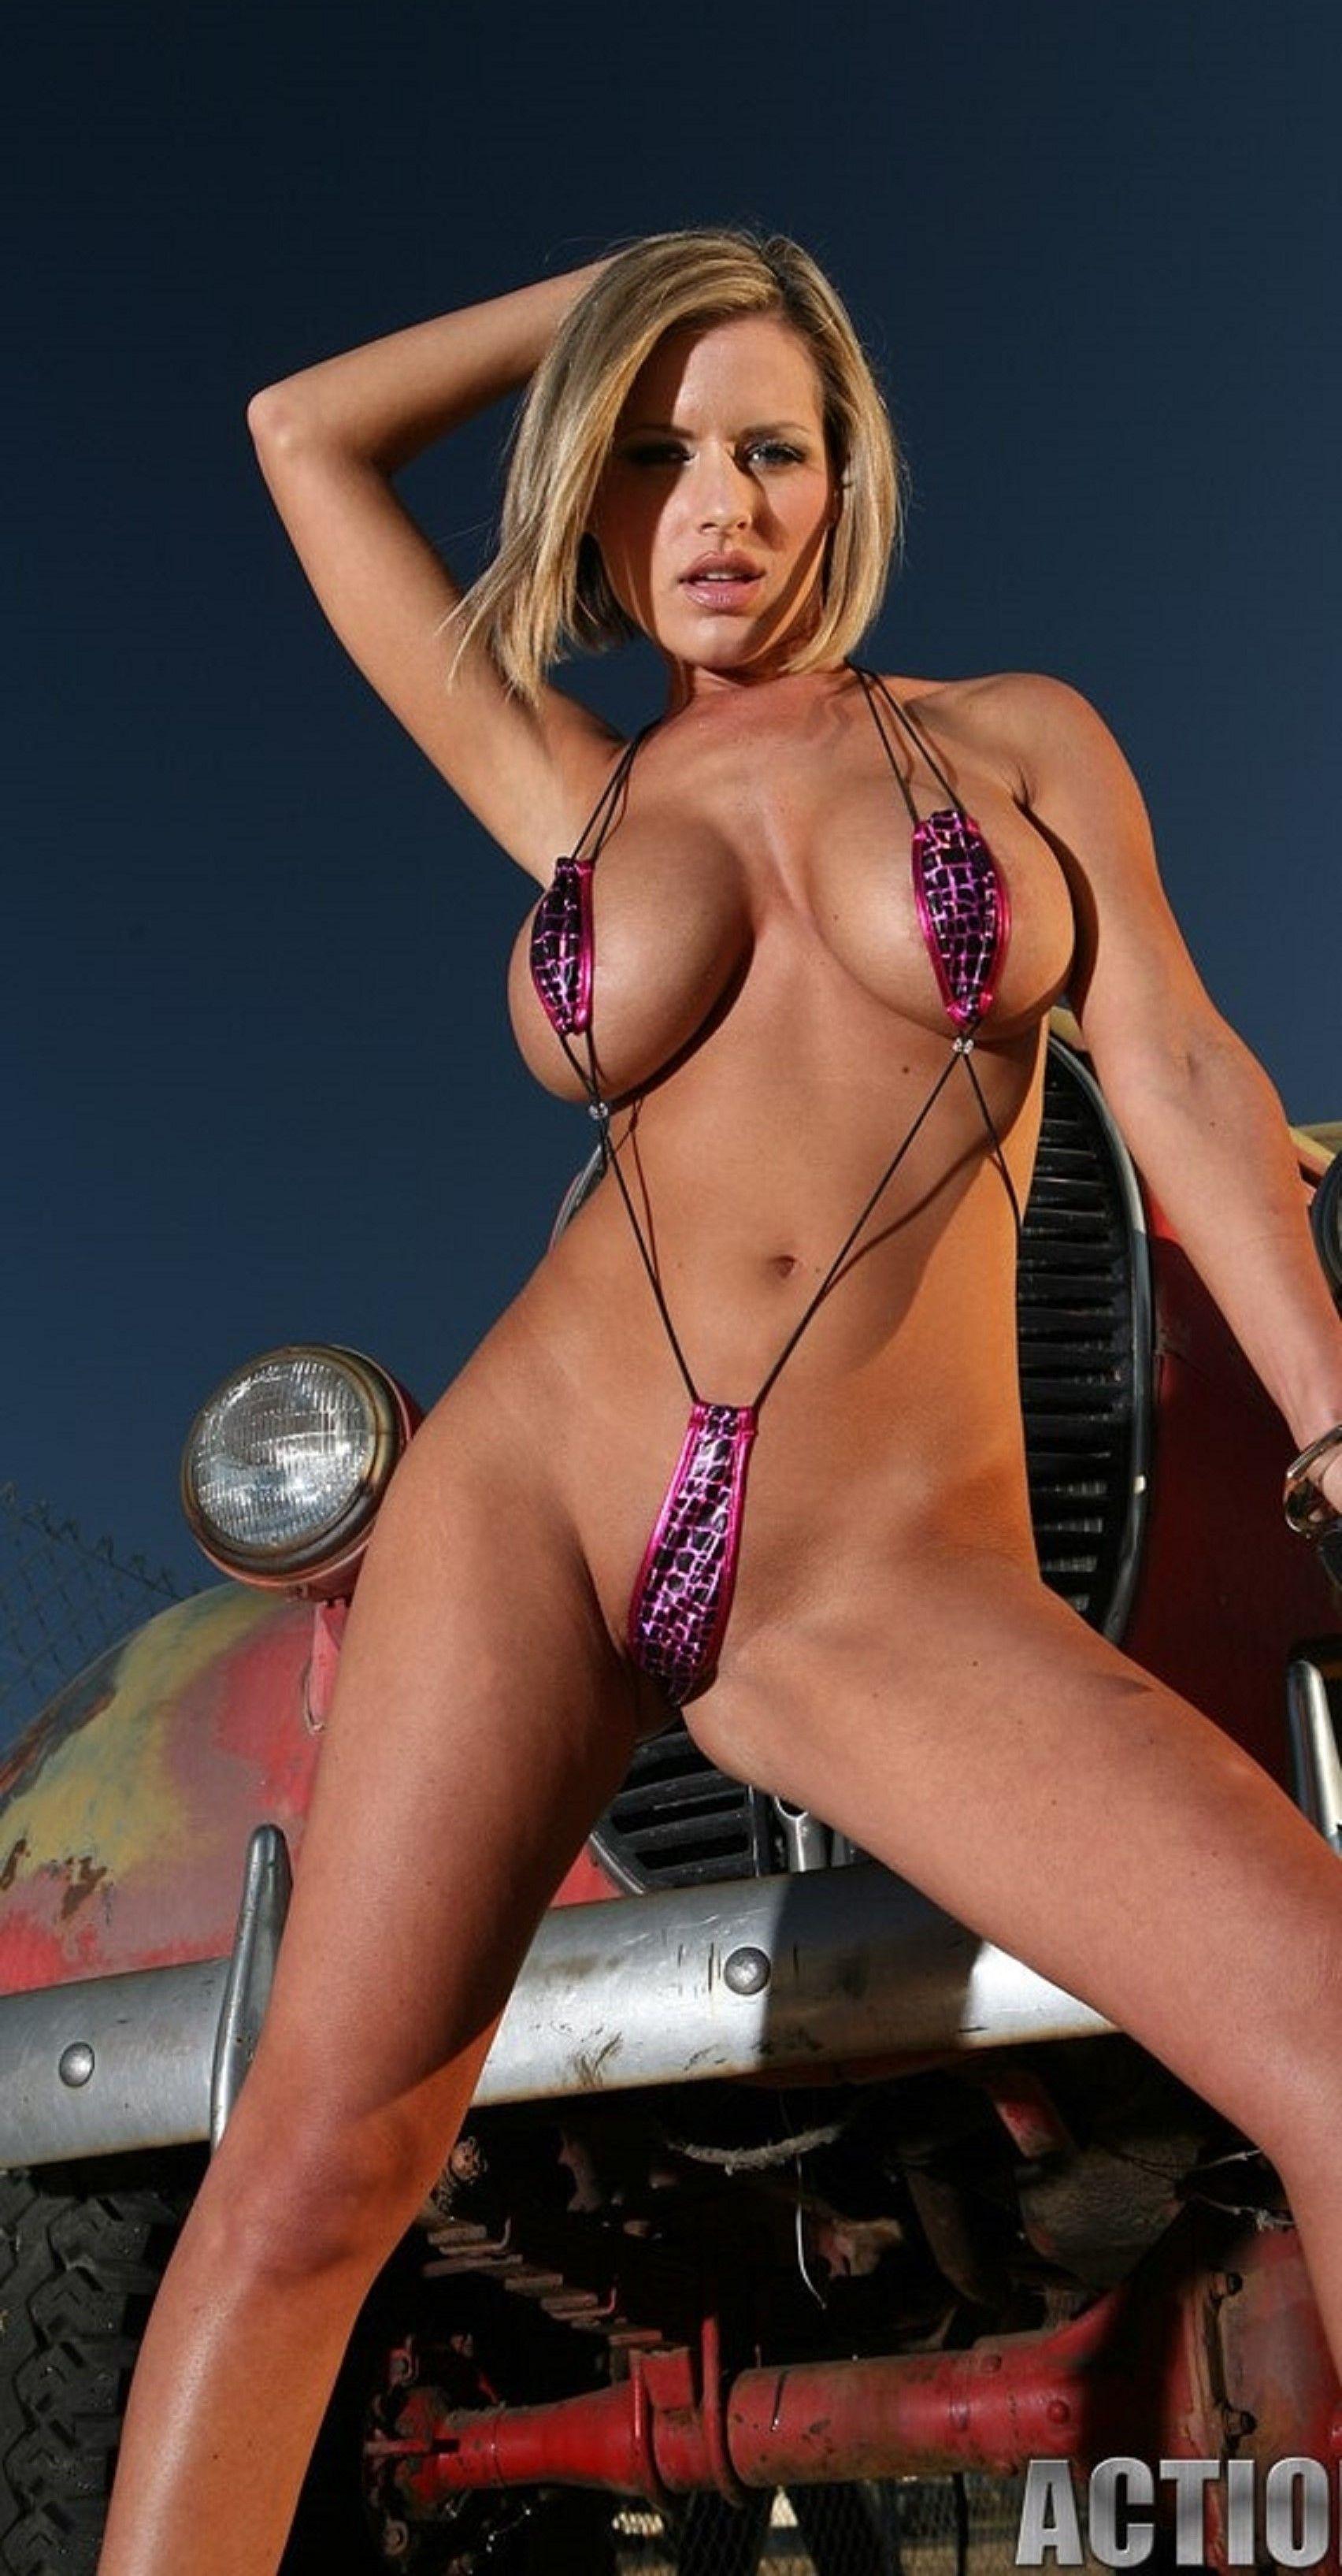 Jenny p bikini girl